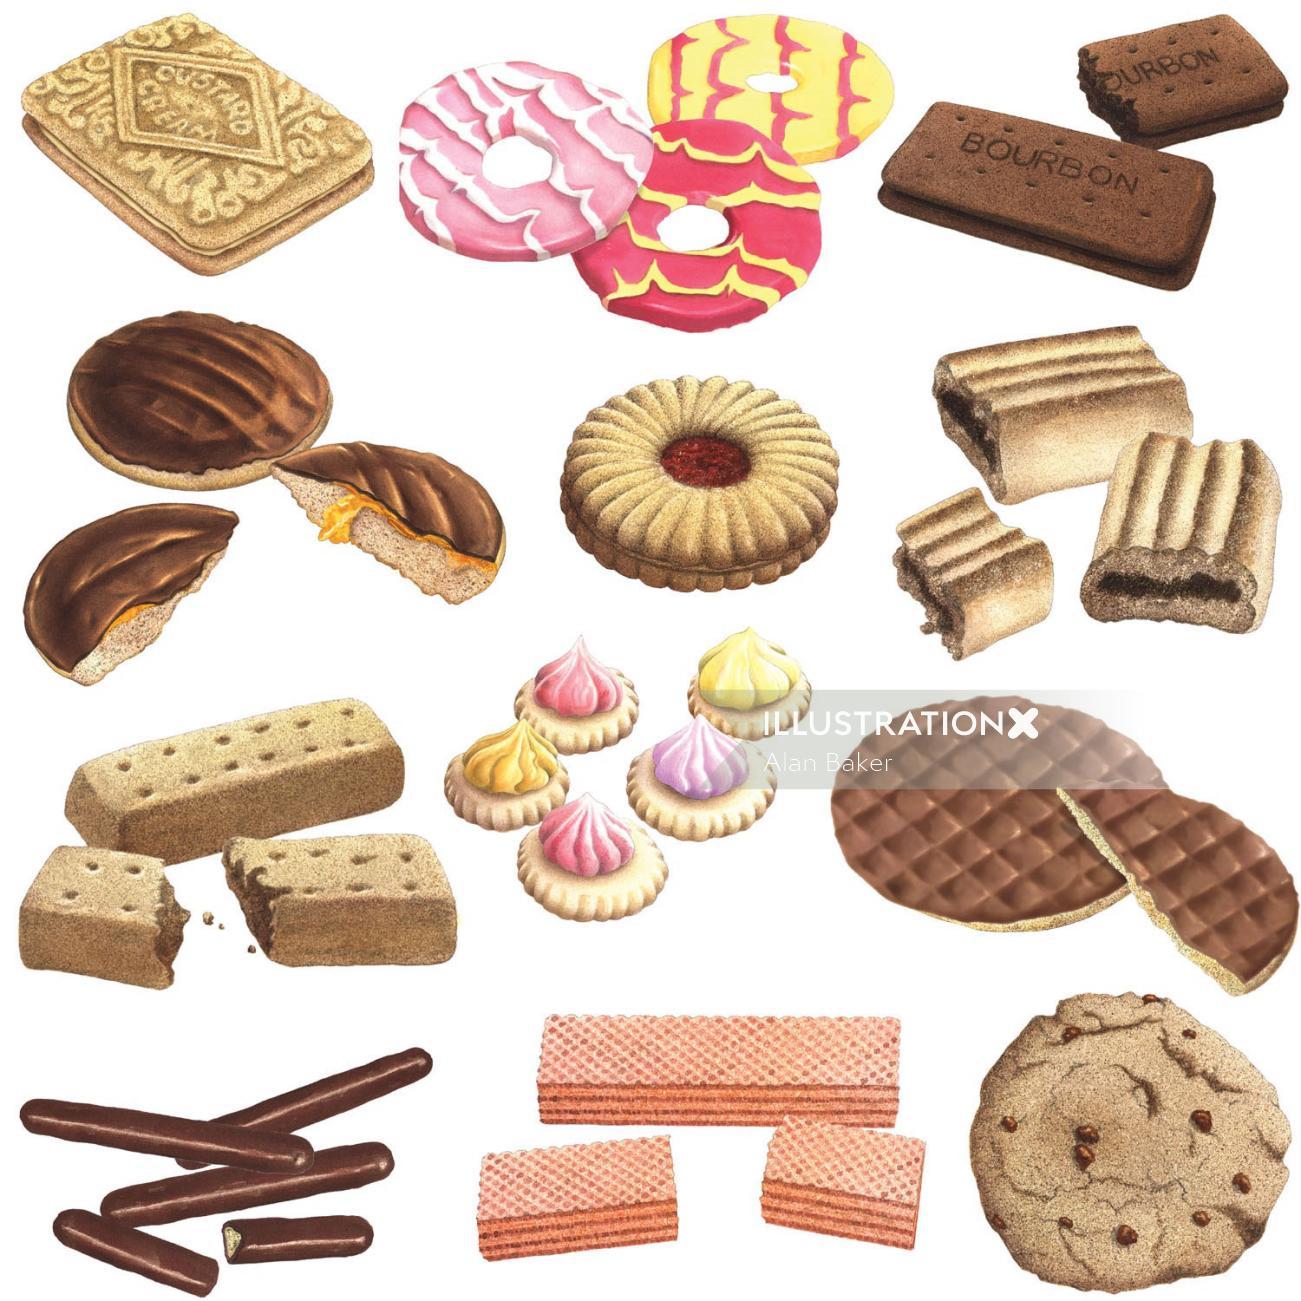 Illustration of biscuits  by Alan Baker